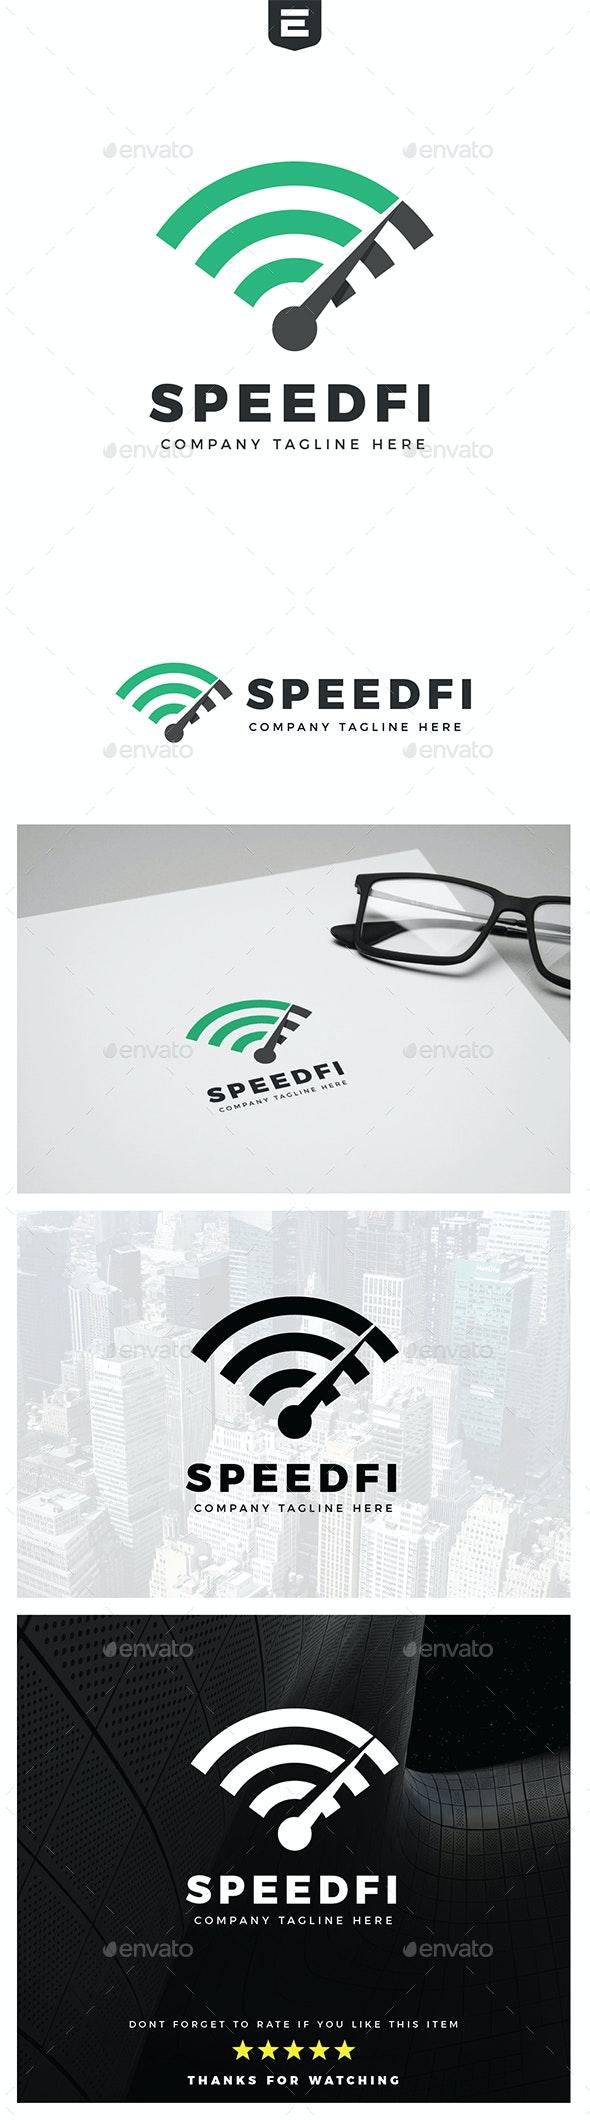 High Speed Wifi - Symbols Logo Templates